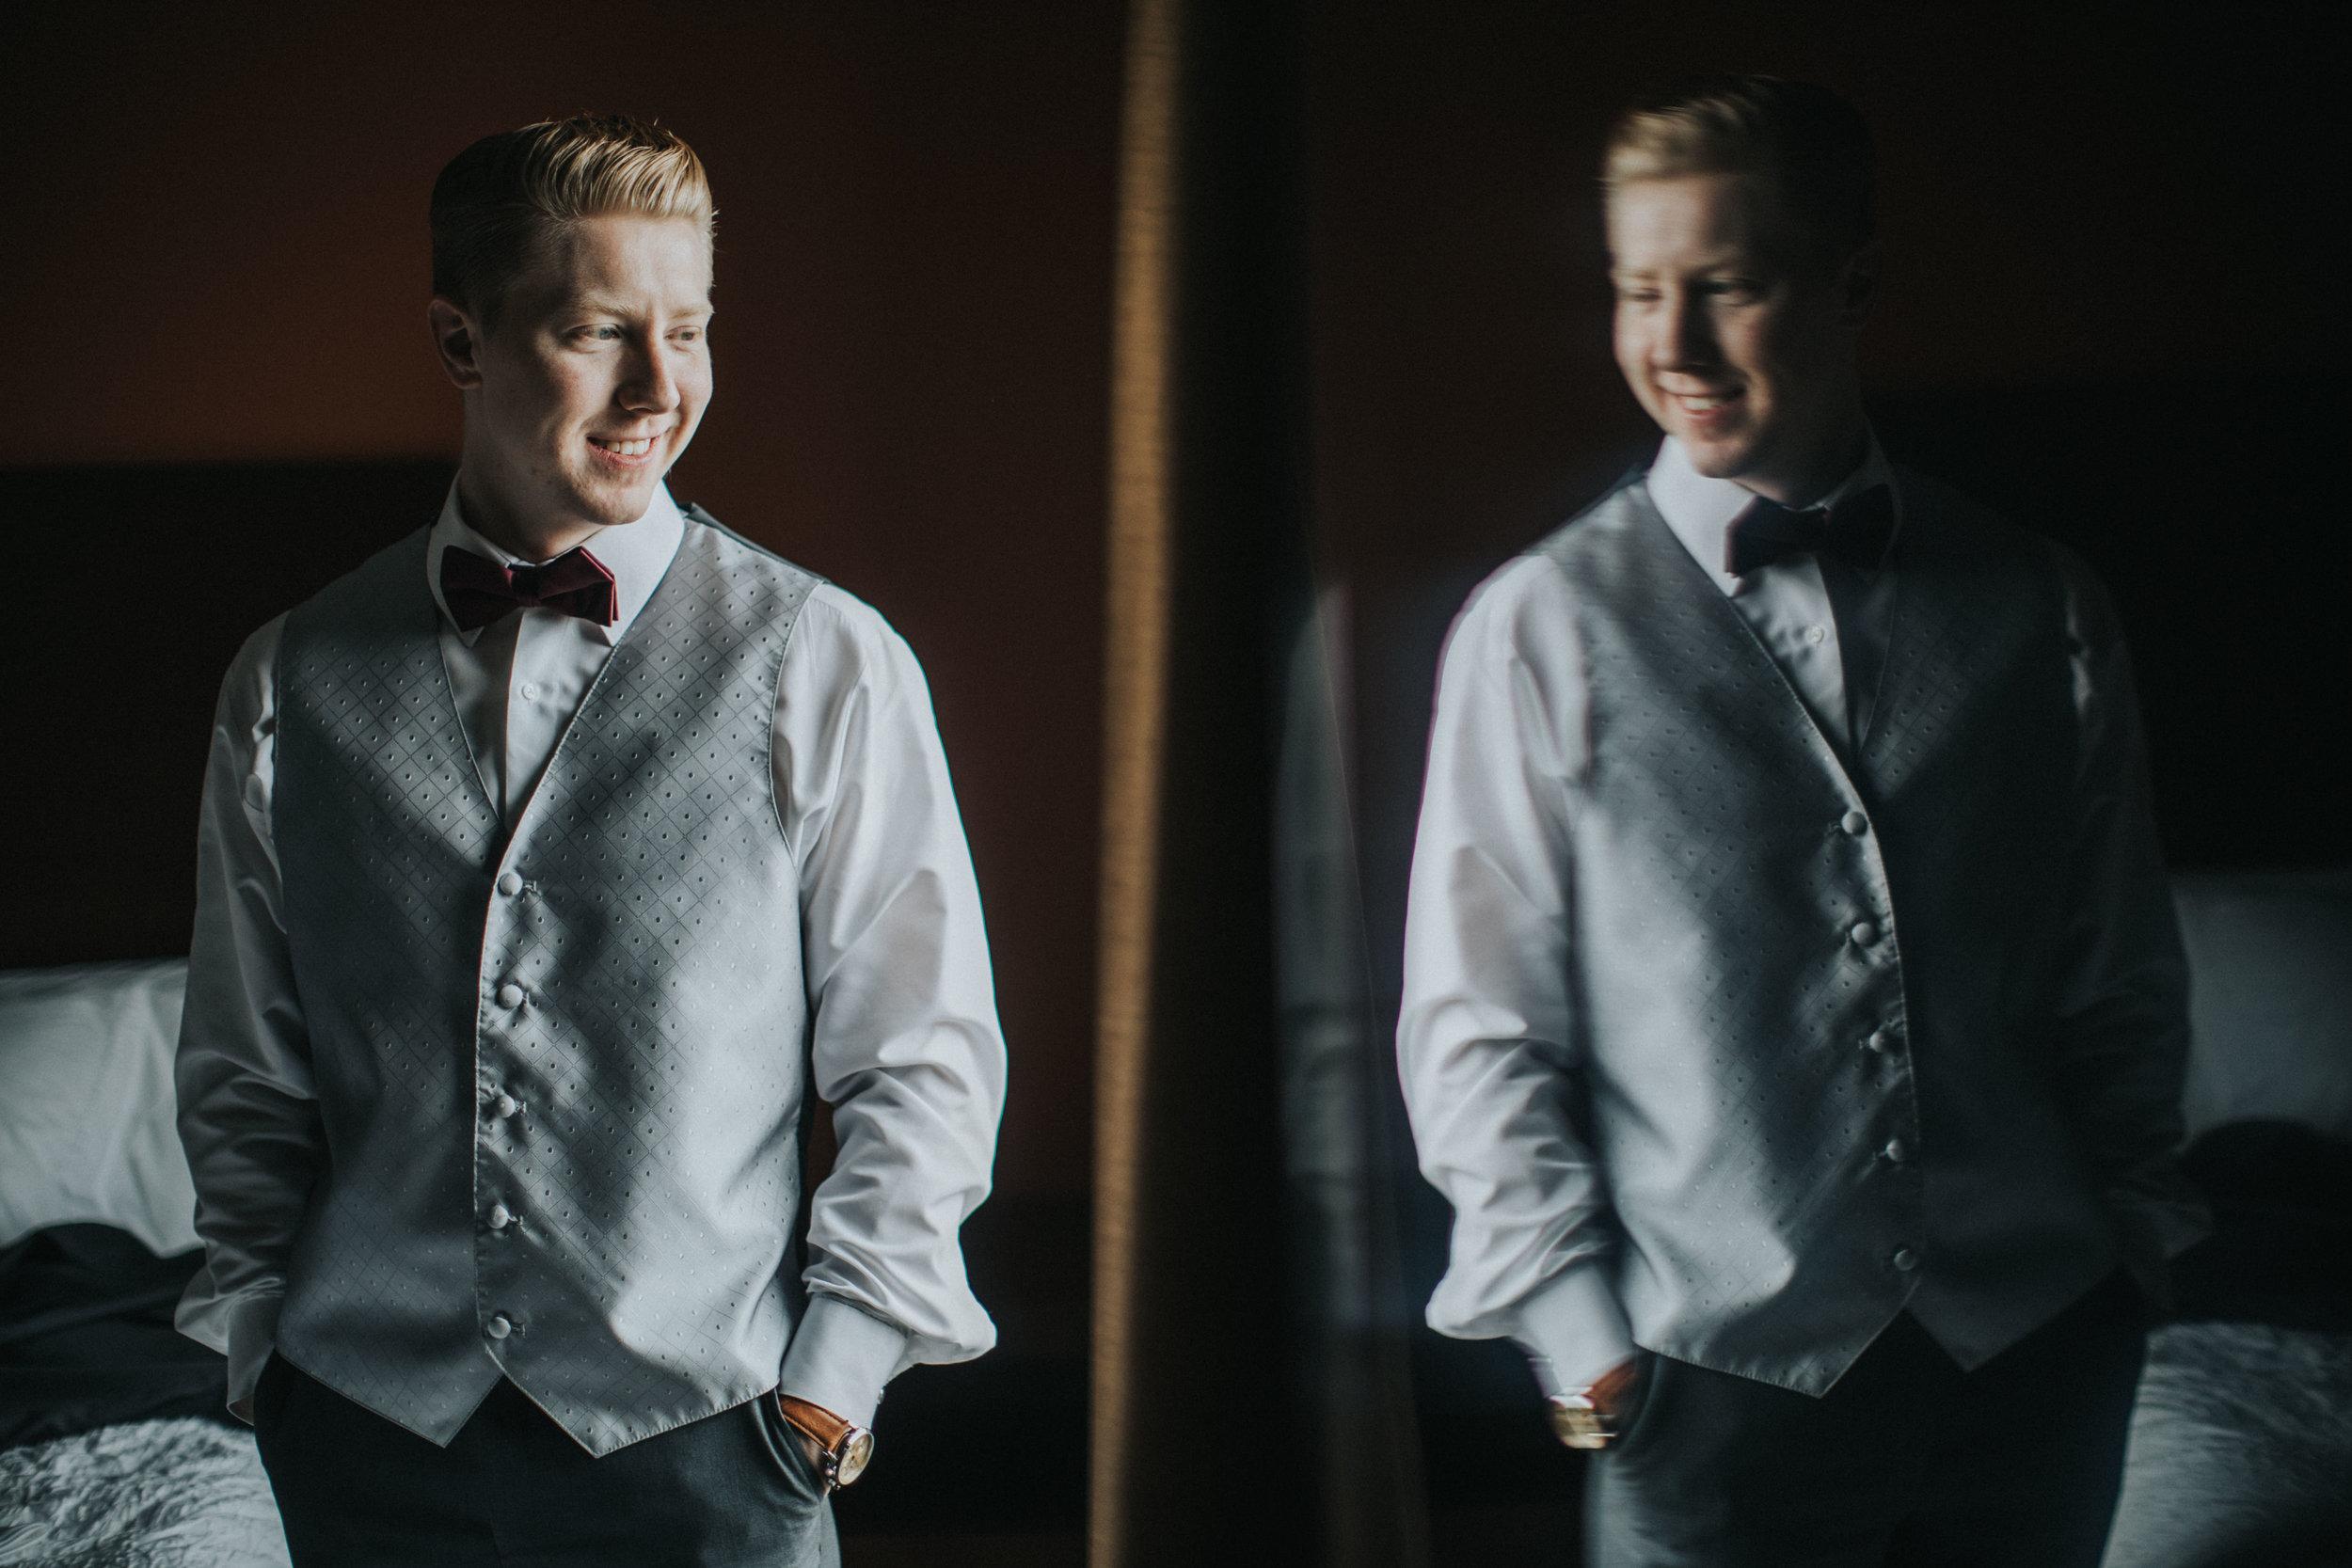 New-Jersey-Wedding-Photography-Fishers-Tudor-House-JennaLynnPhotography-Getting-Ready-Kathleen&Eddie-95.jpg